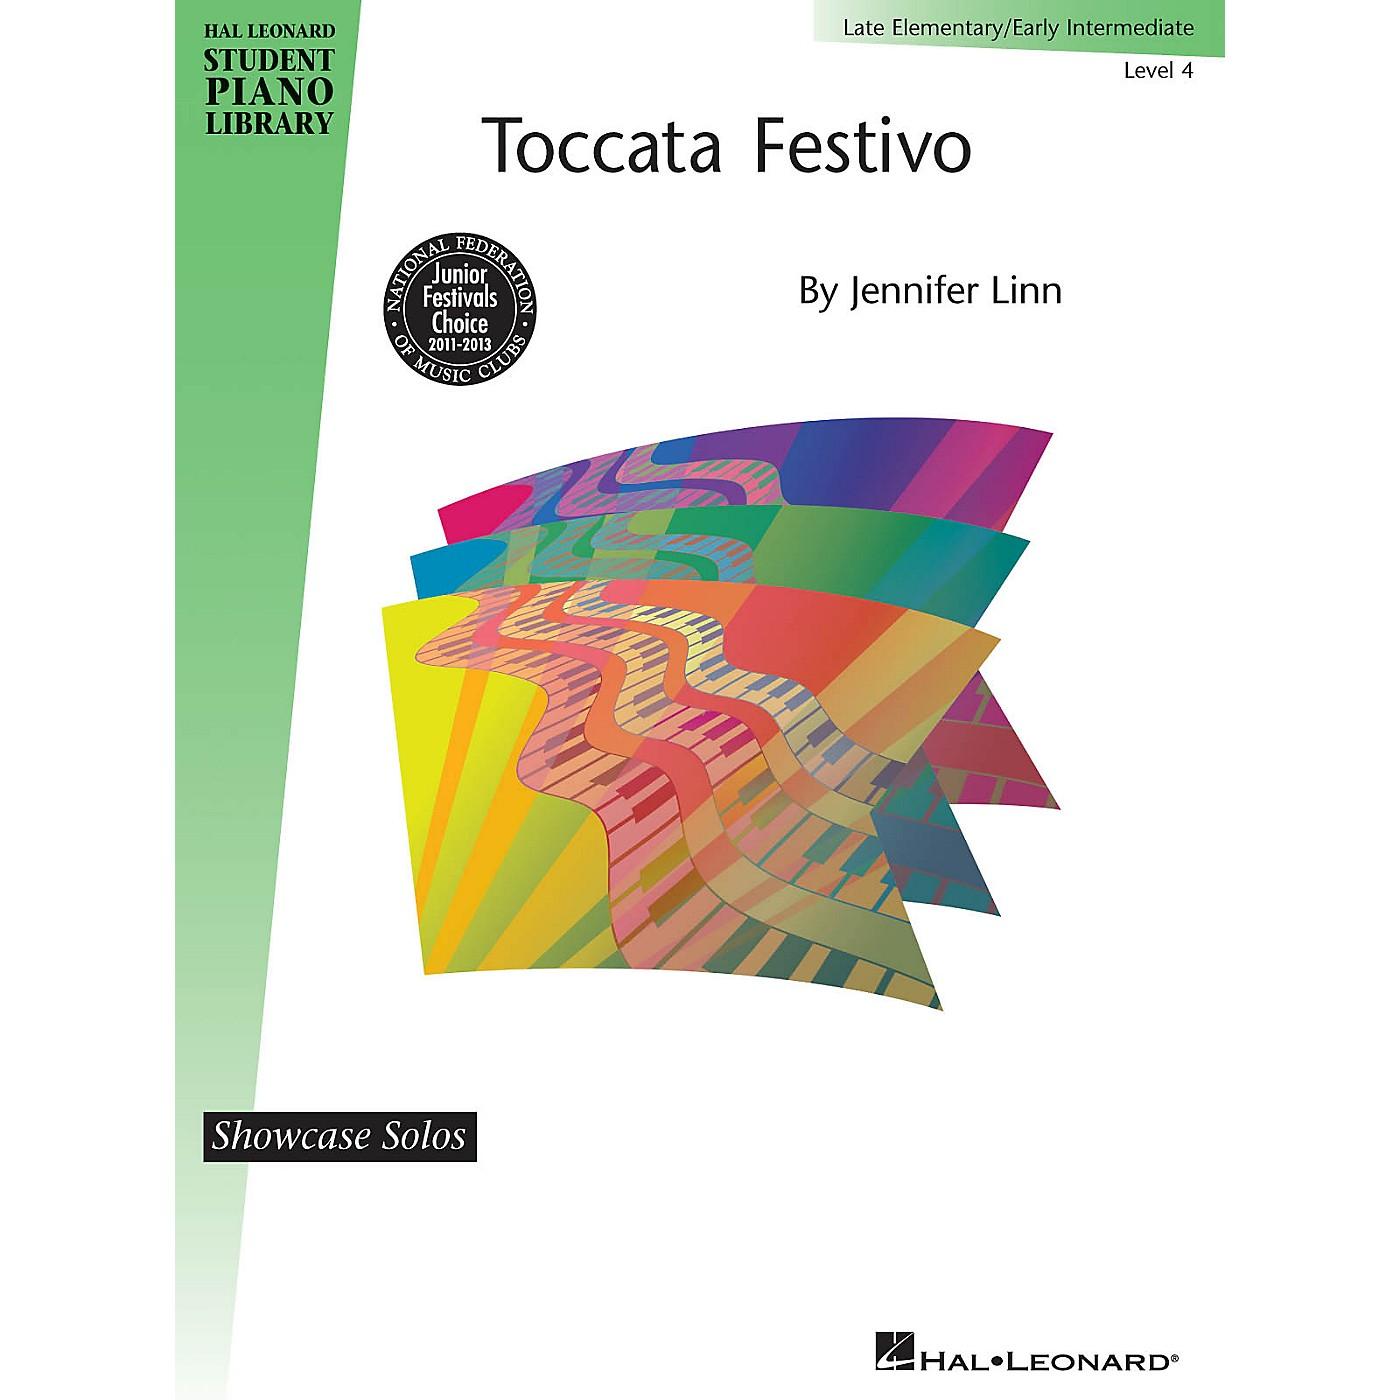 Hal Leonard Toccata Festivo Piano Library Series by Jennifer Linn (Level Early Inter) thumbnail